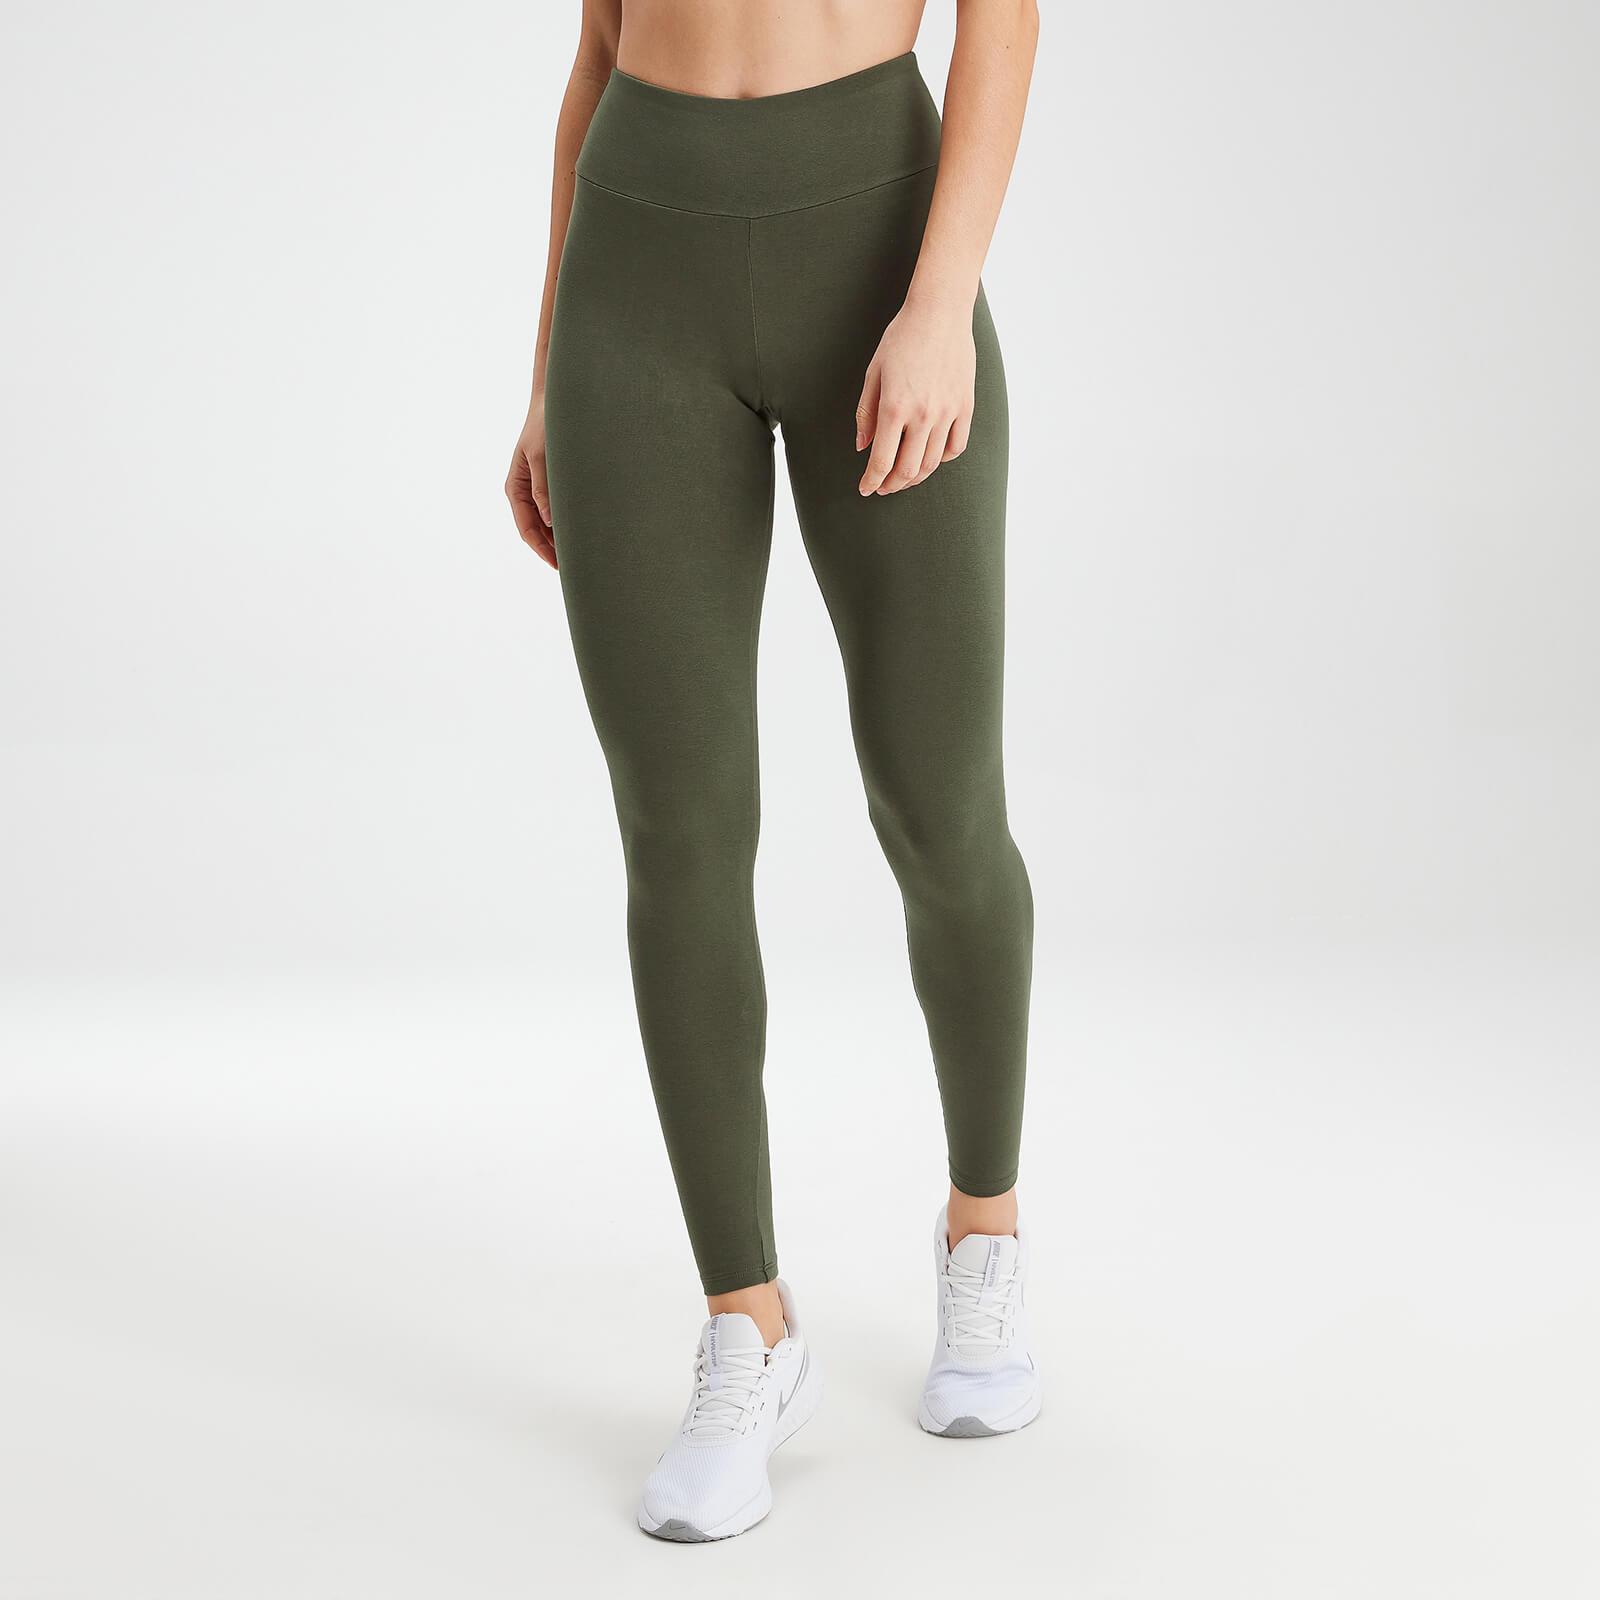 MP Women's Essentials Leggings - Dark Olive - XL